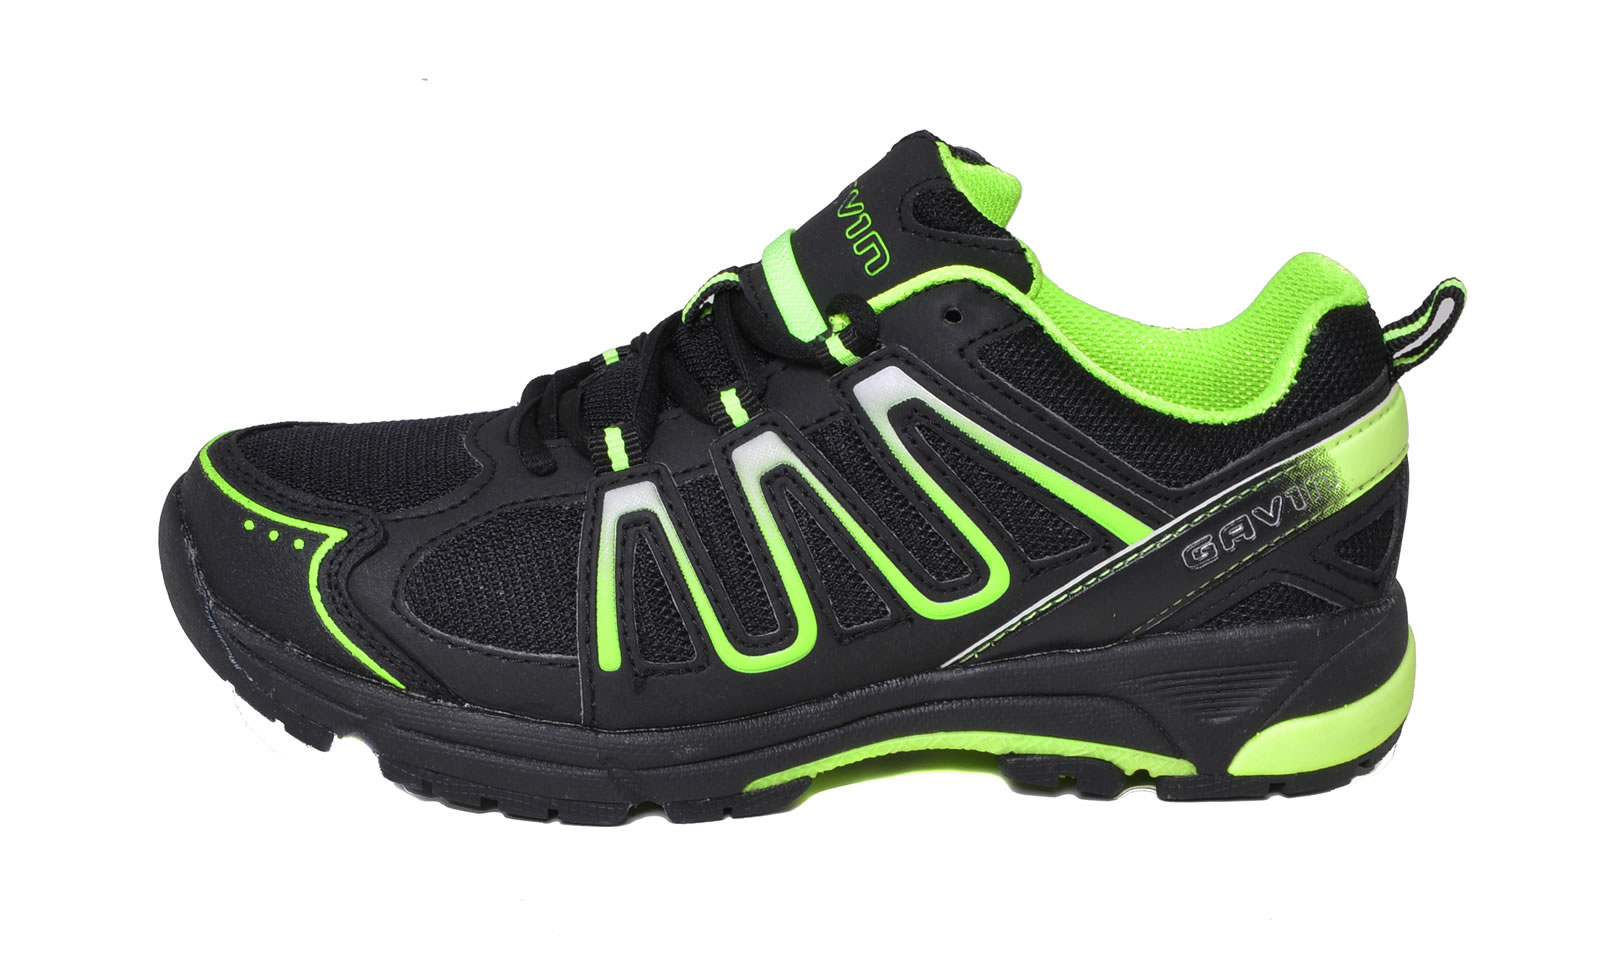 Gavin-Mountain-MTB-Sneaker-Style-Cycling-Shoe thumbnail 4